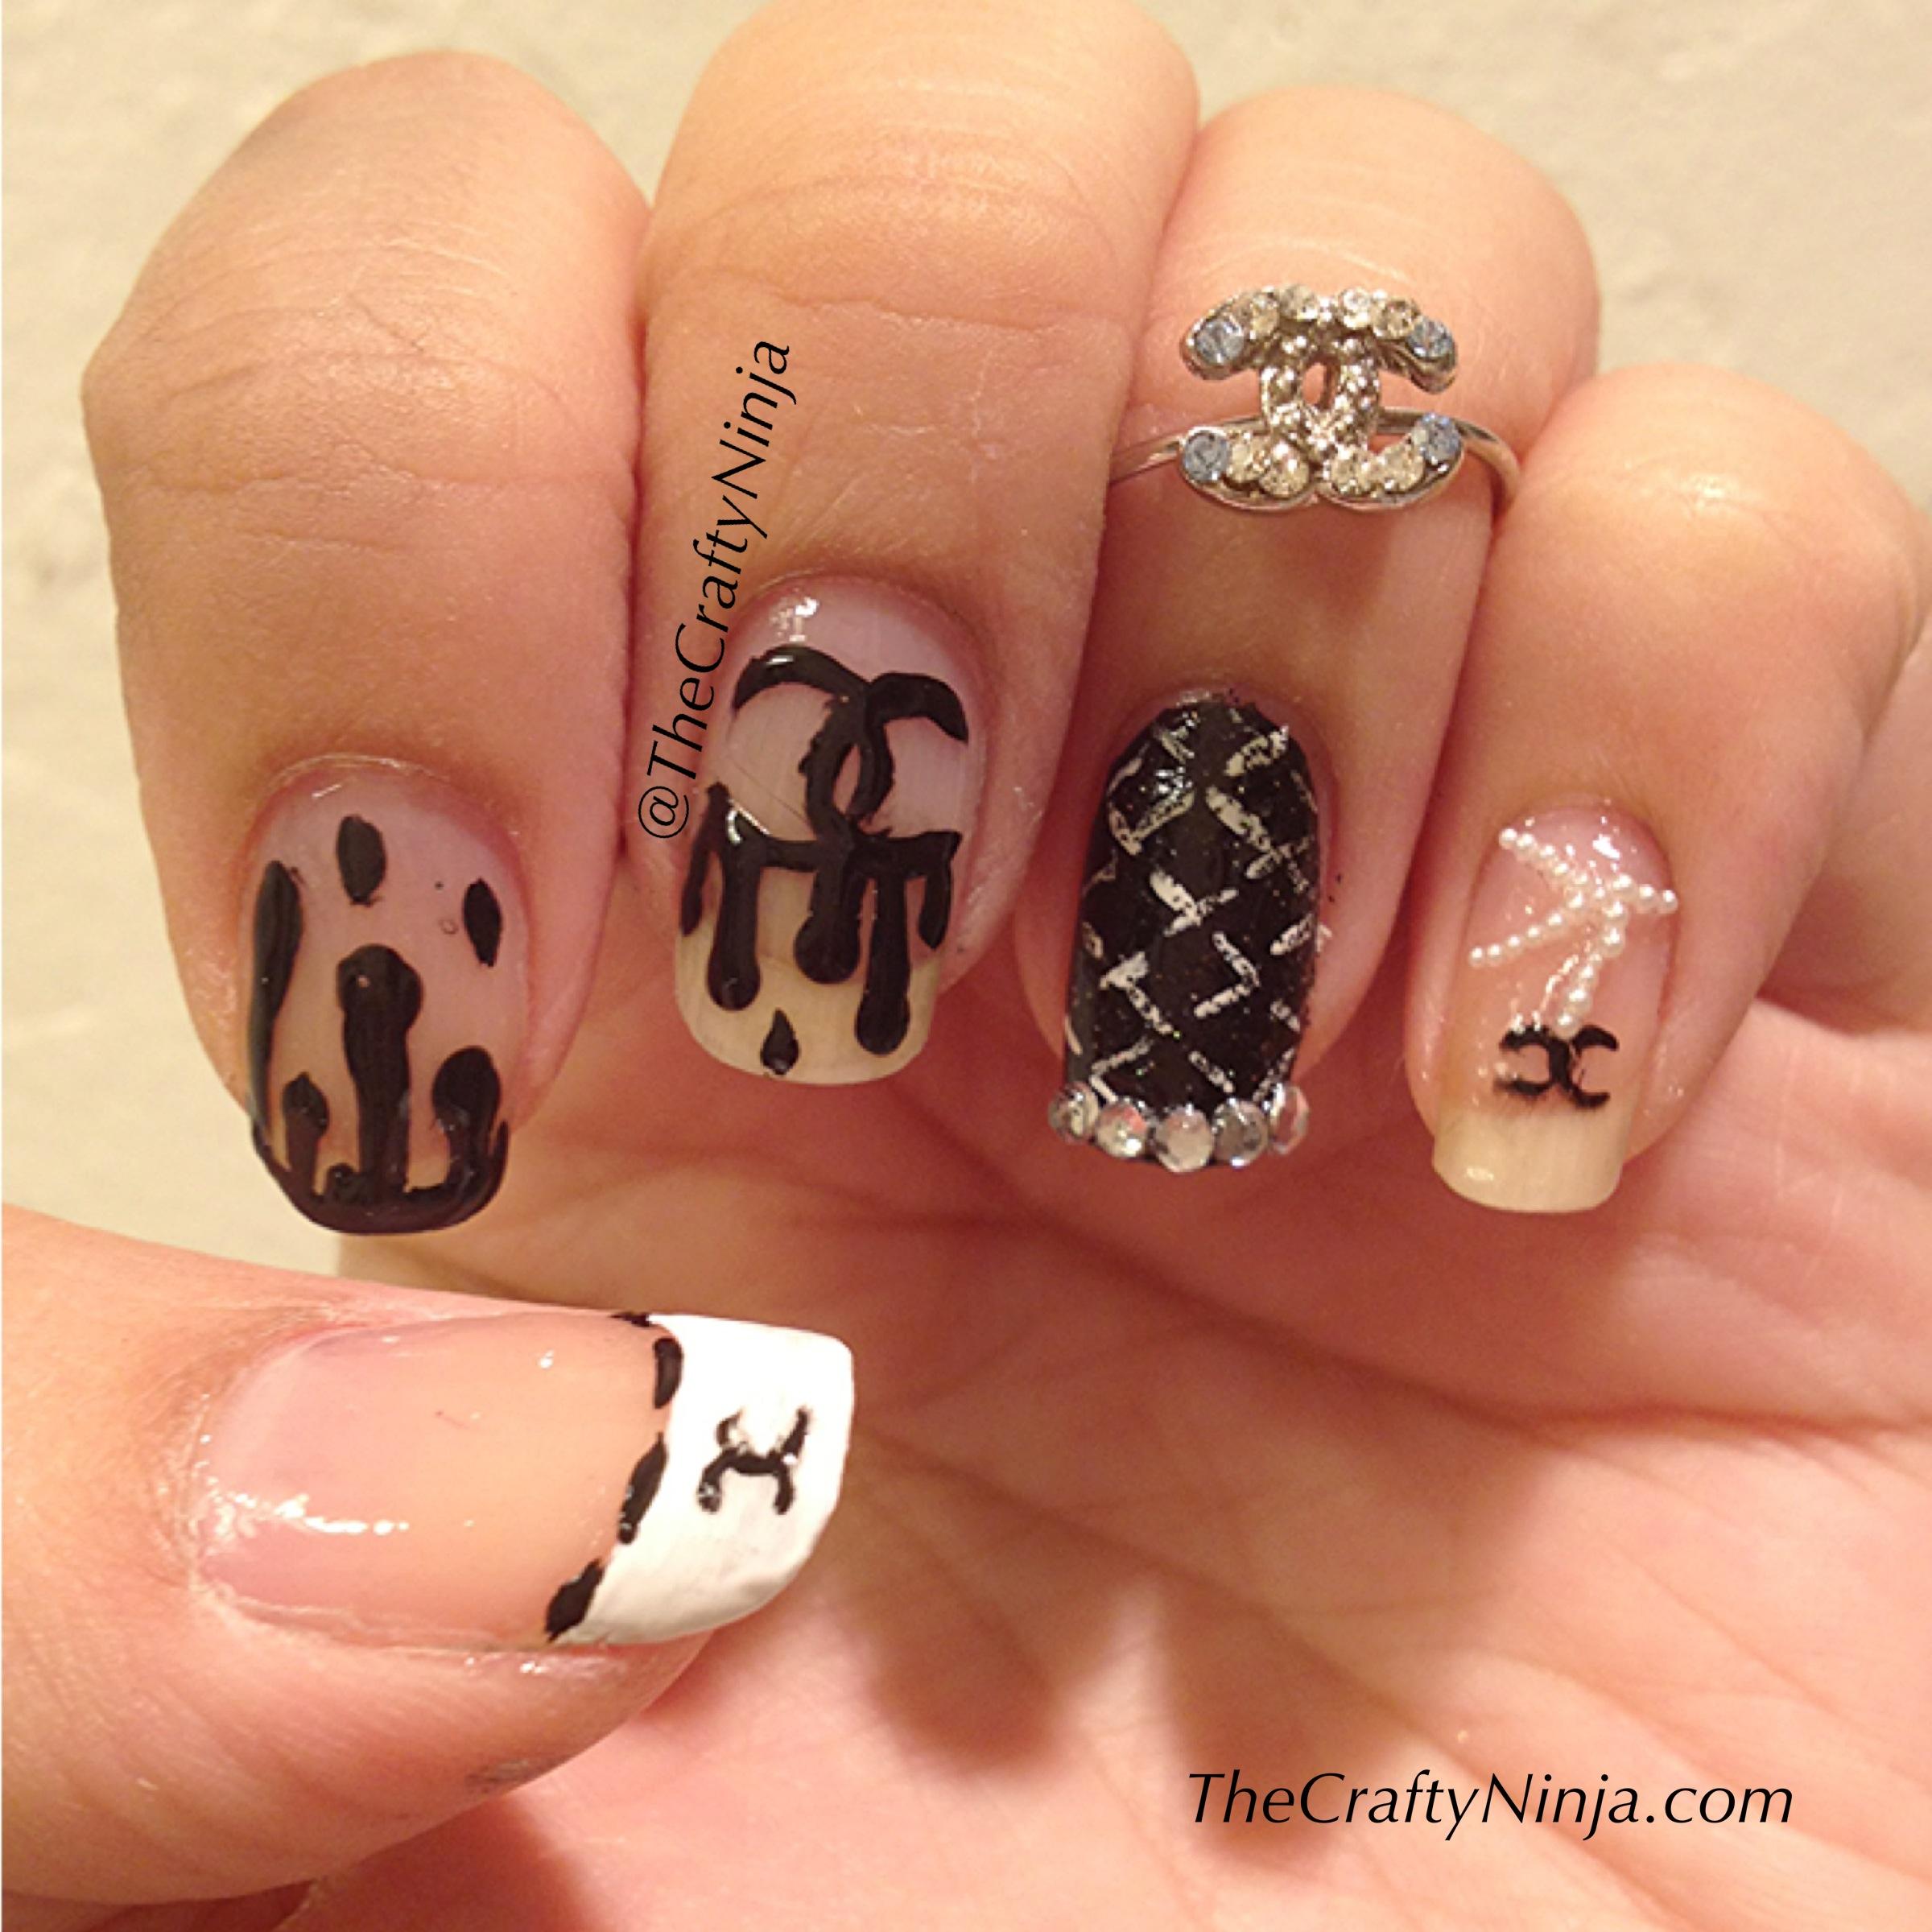 Chanel Nails The Crafty Ninja